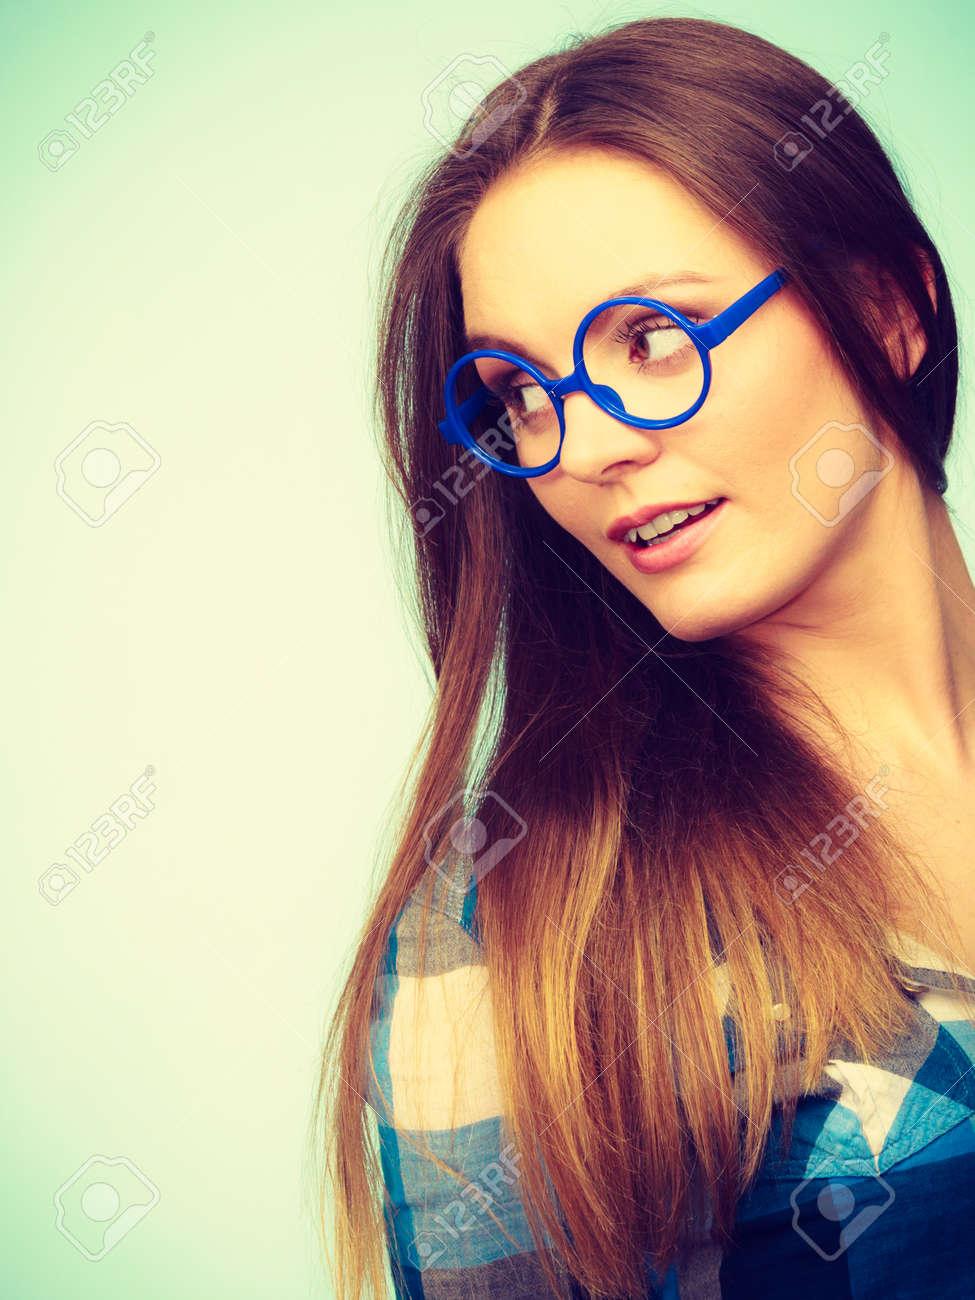 Weird Fun Glasses 5